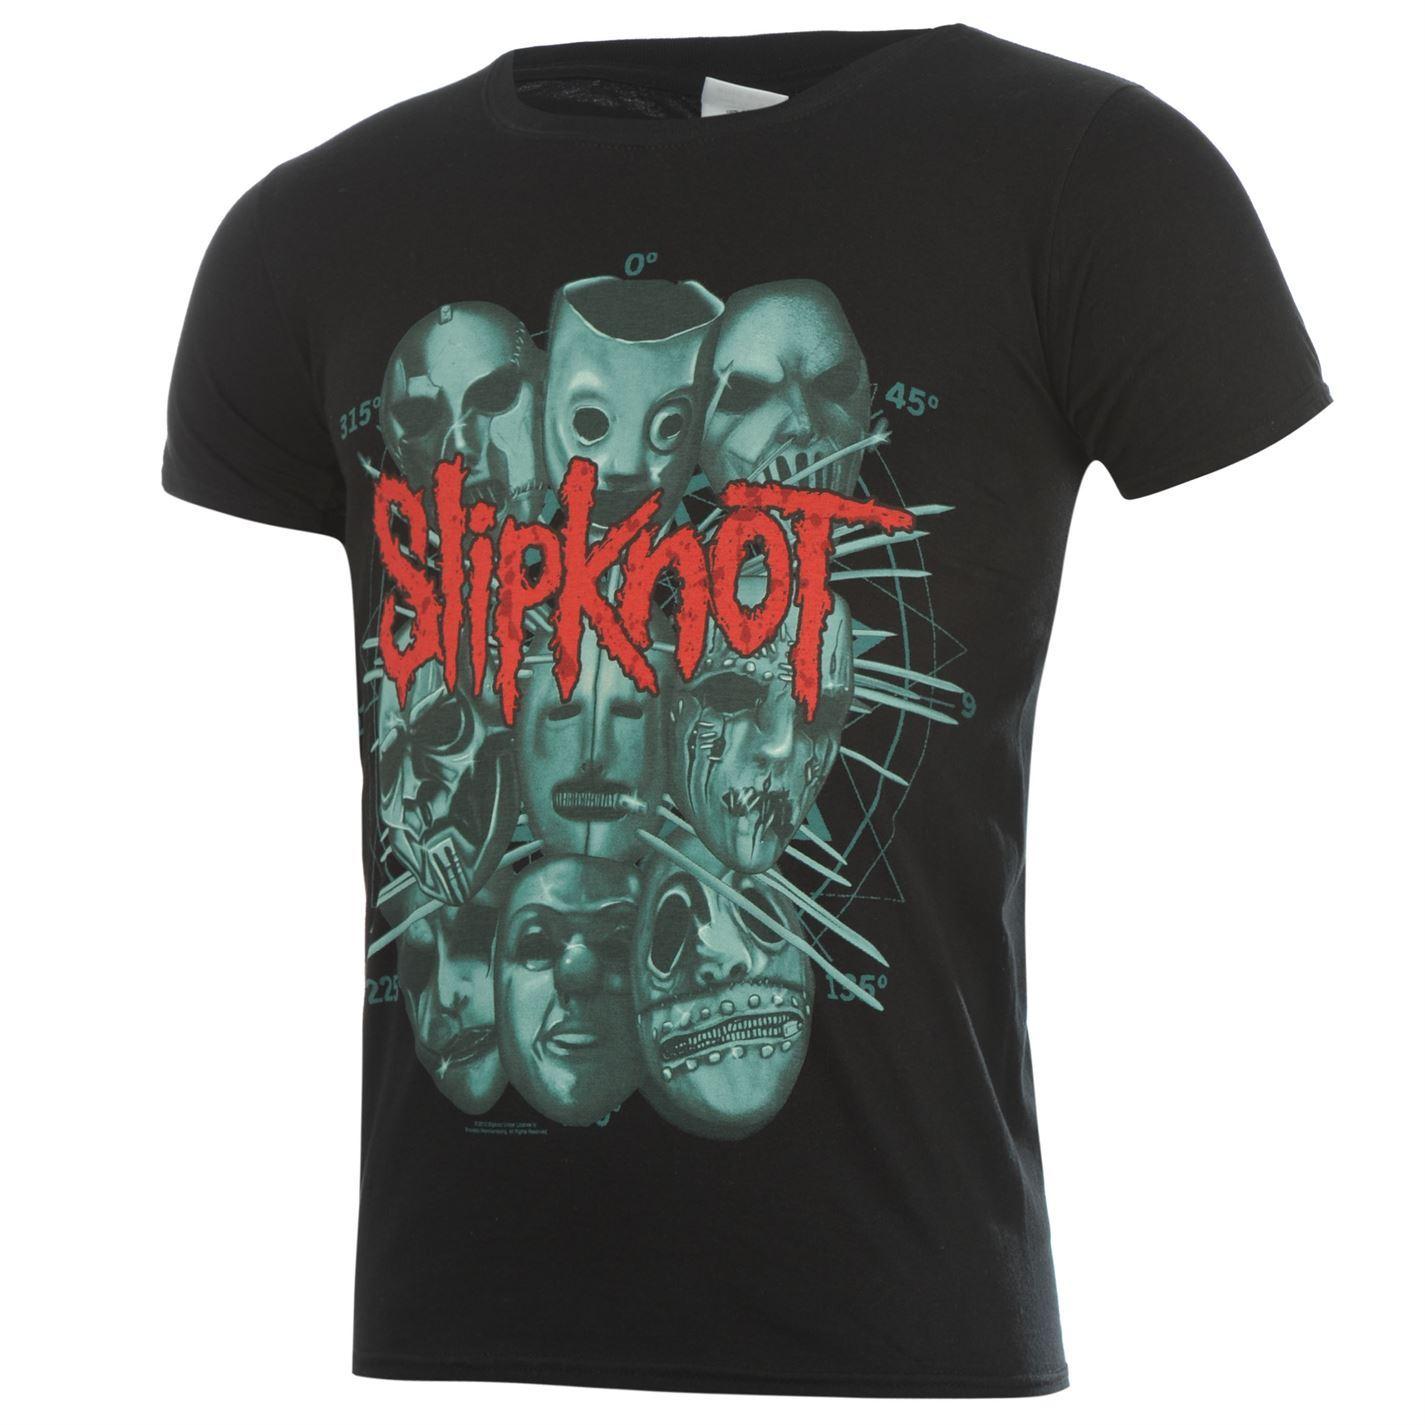 Official-Slipknot-T-Shirt-Mens-Masks-Top-Tee-Tshirt thumbnail 3